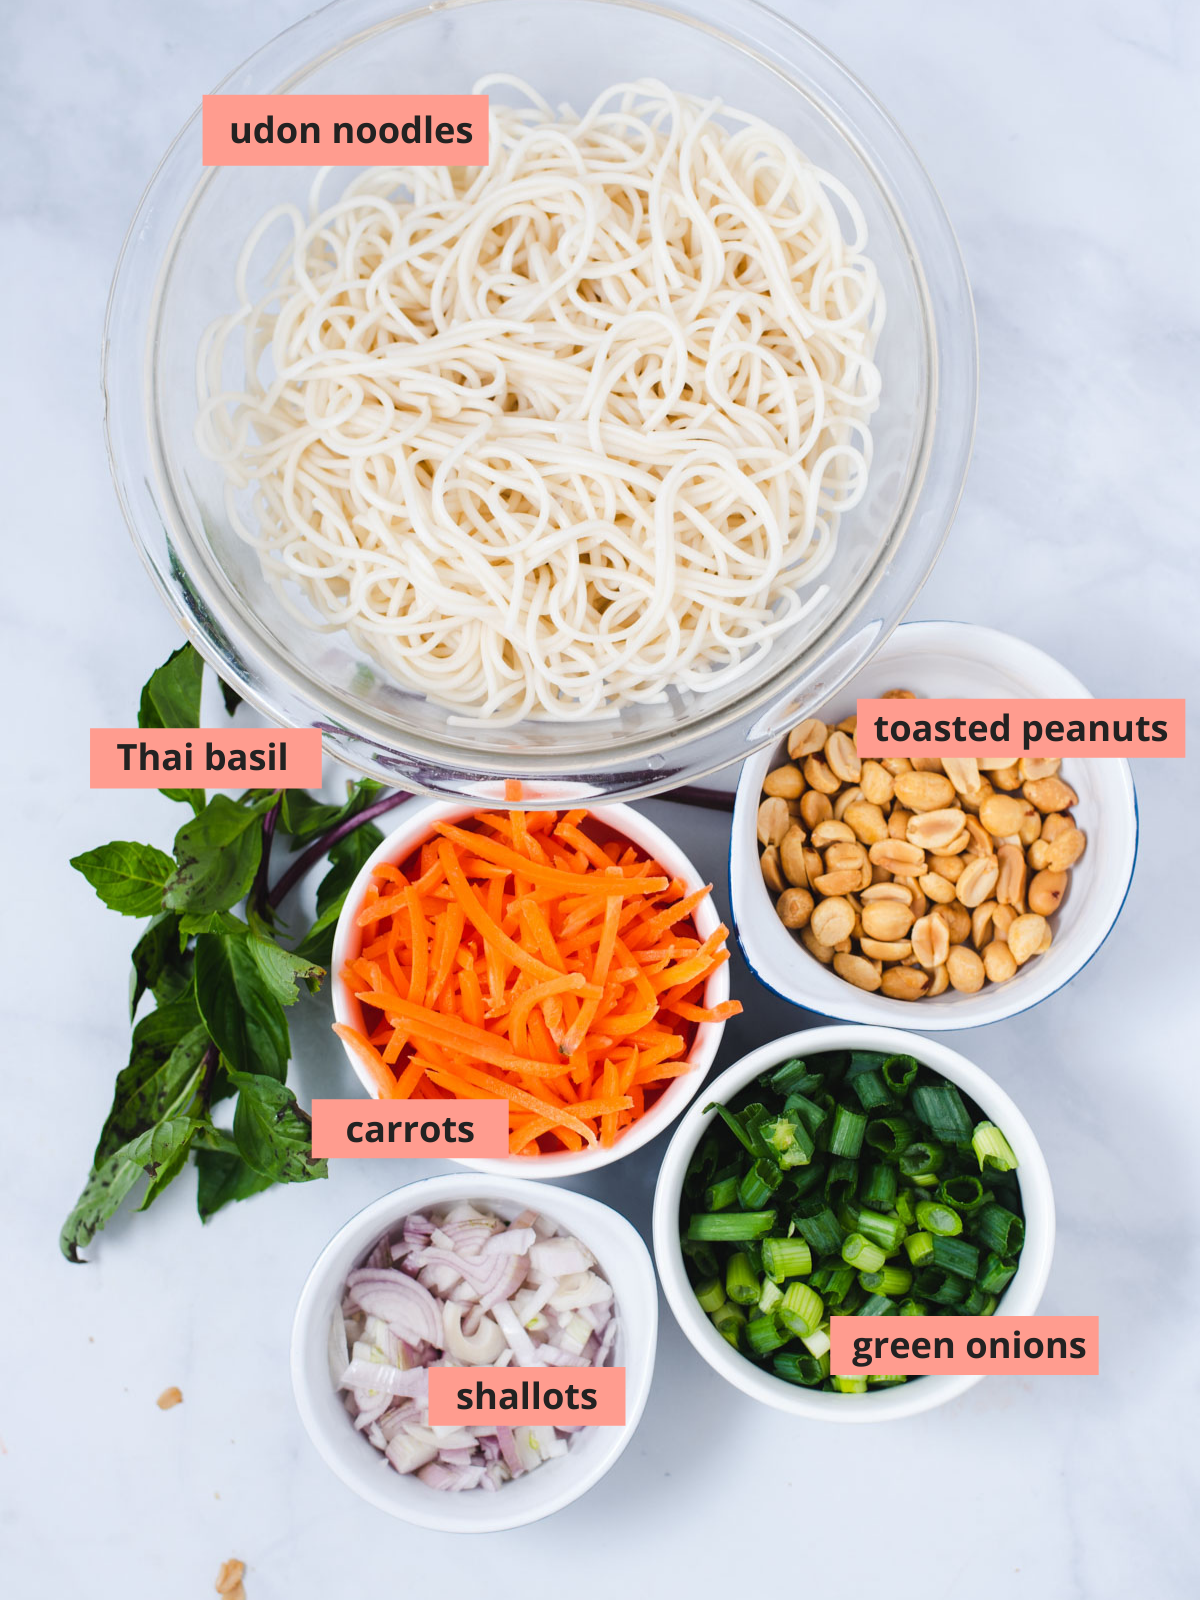 Labeled ingredients to make noodle salad